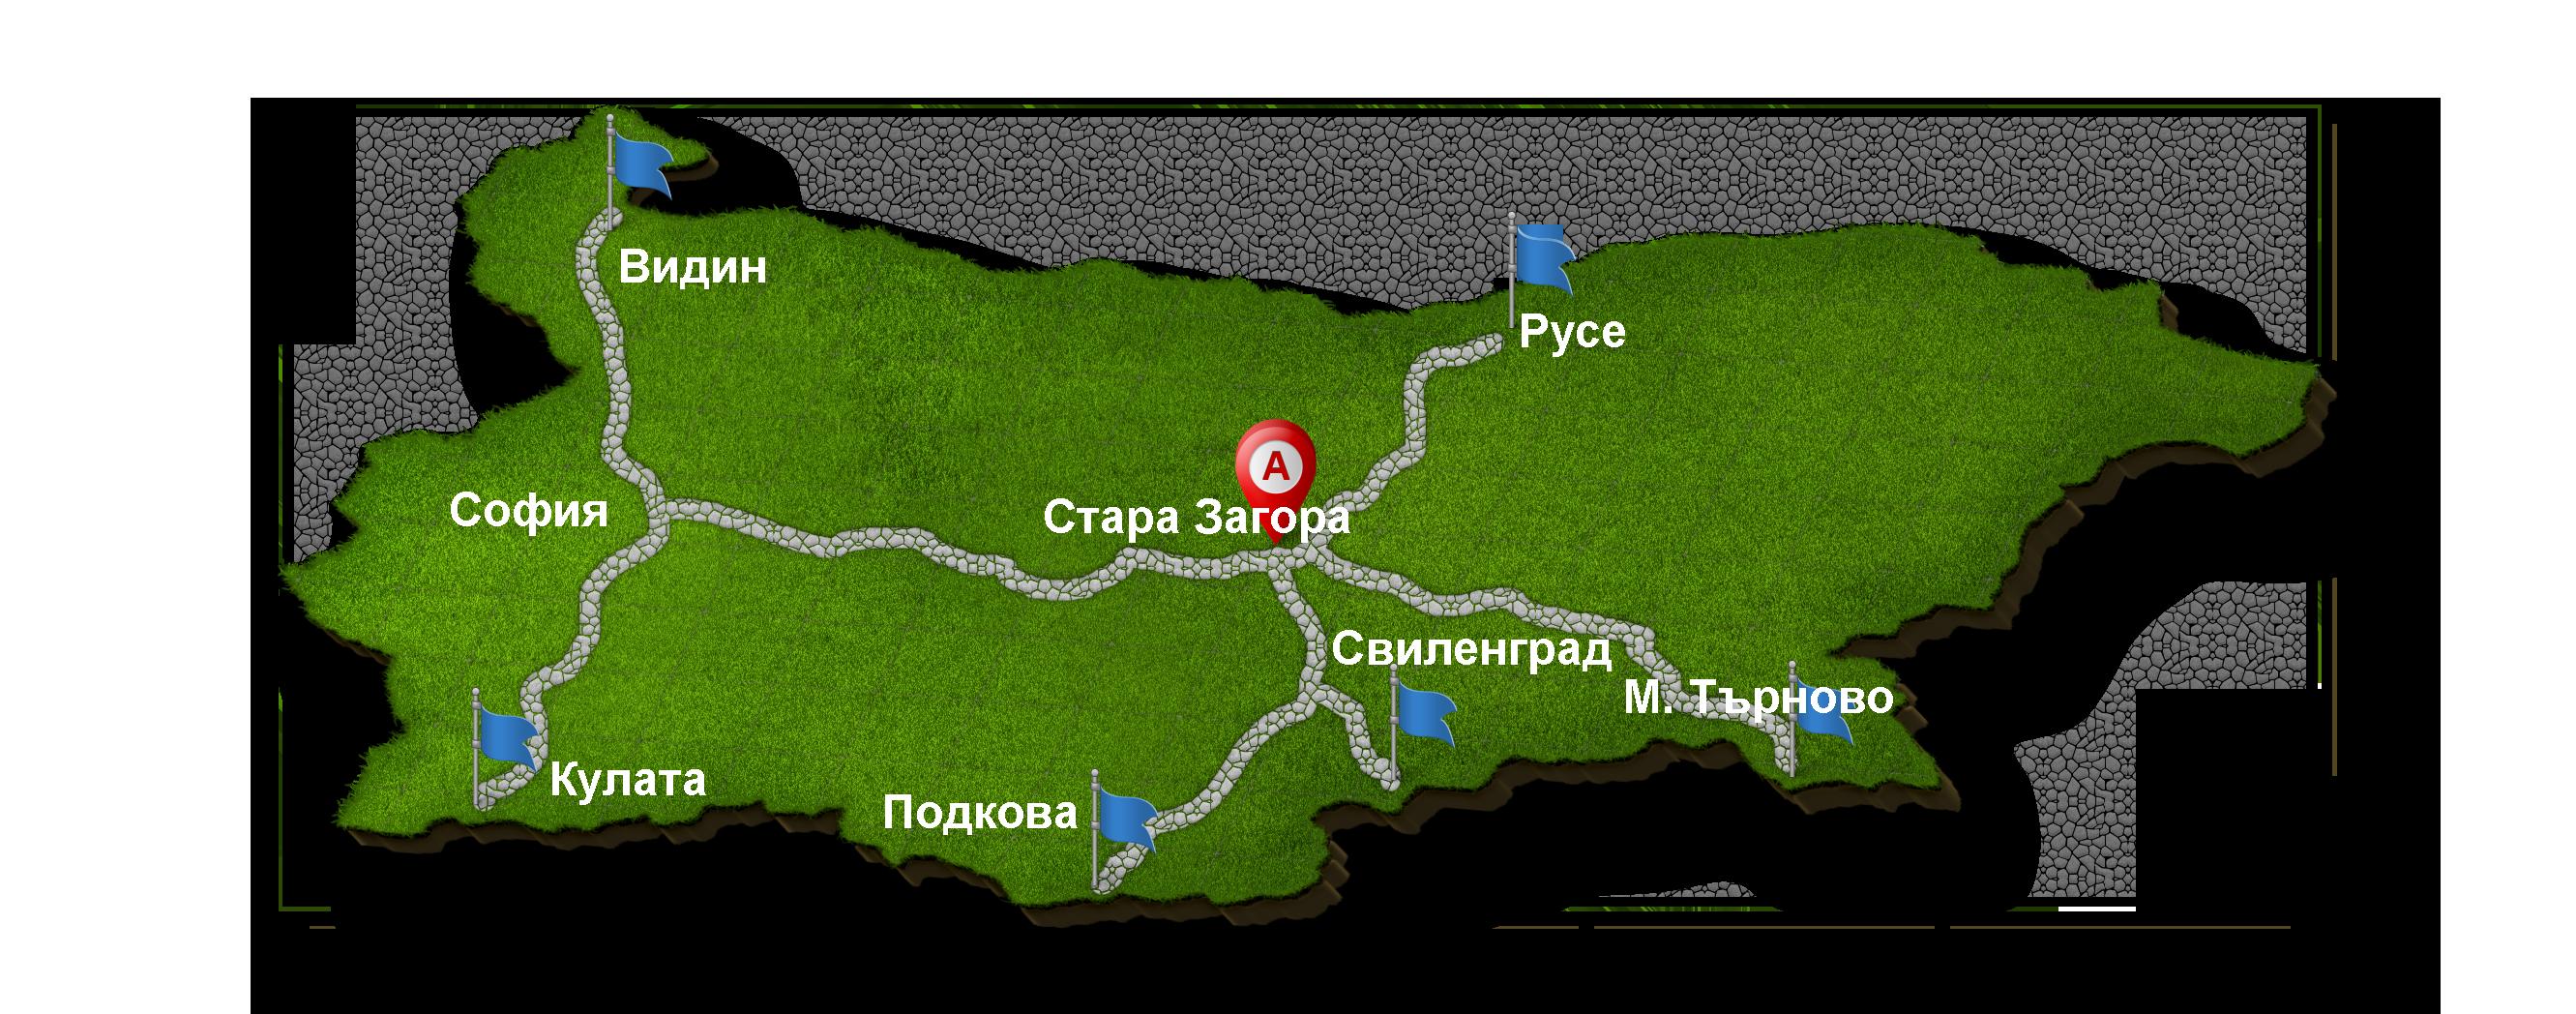 Bulgaria-map-3d